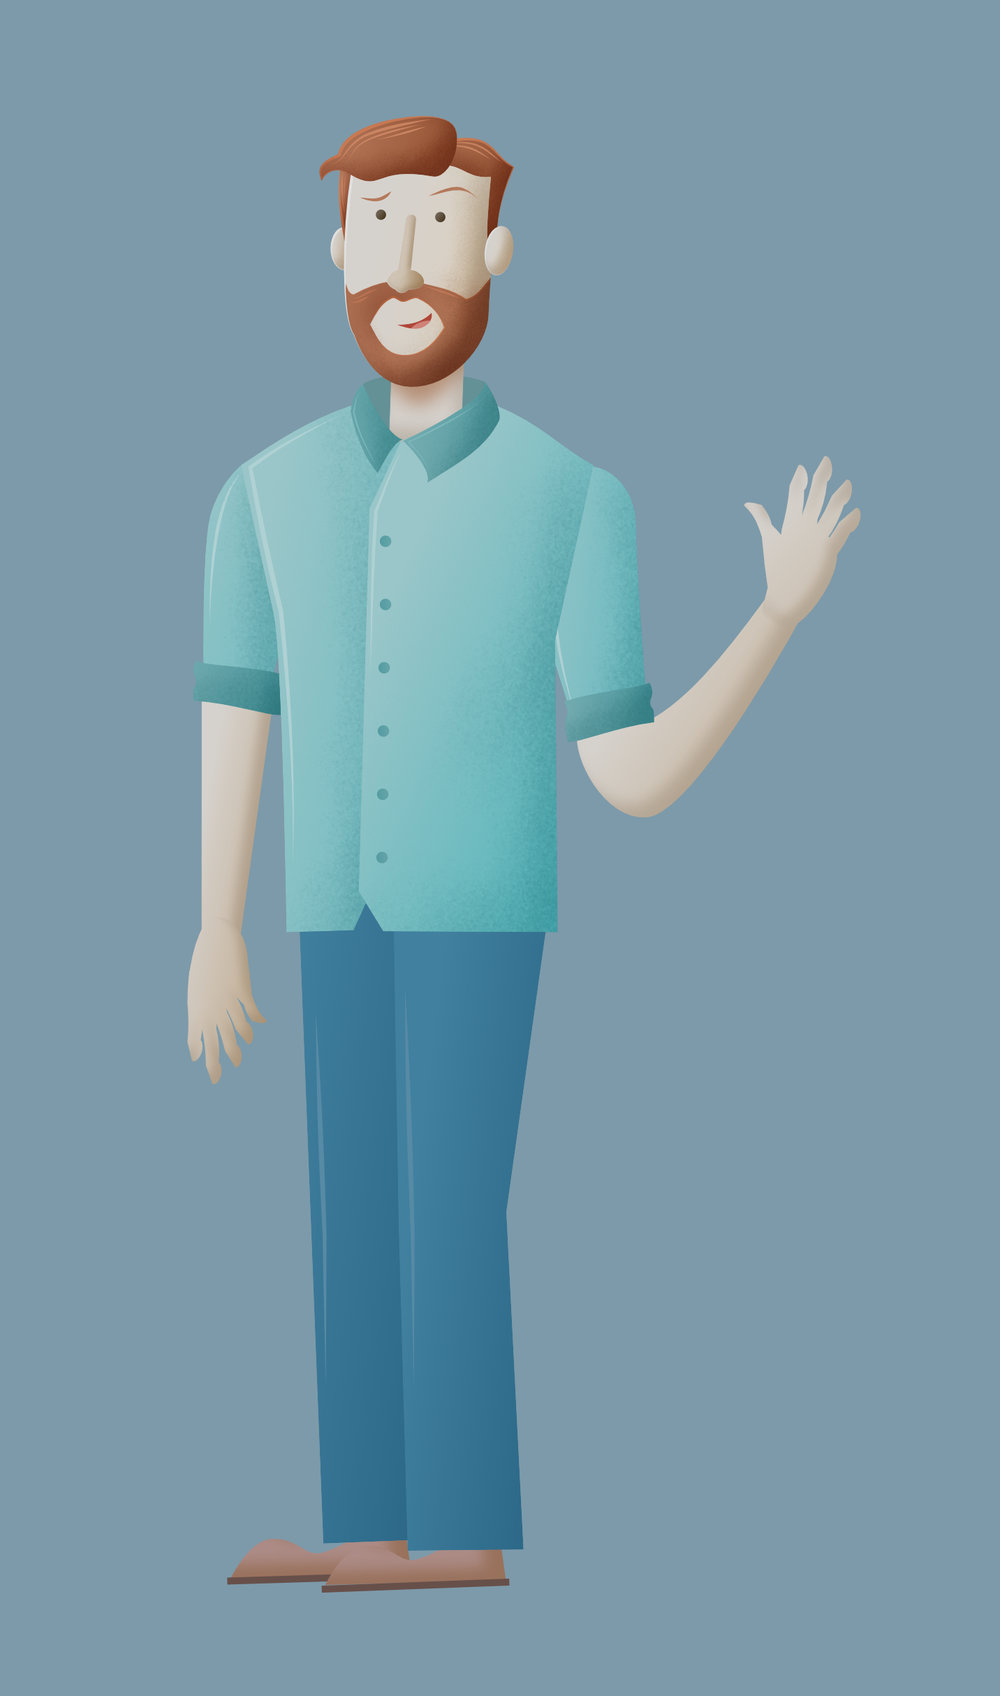 character design_ginger man awkward.jpg